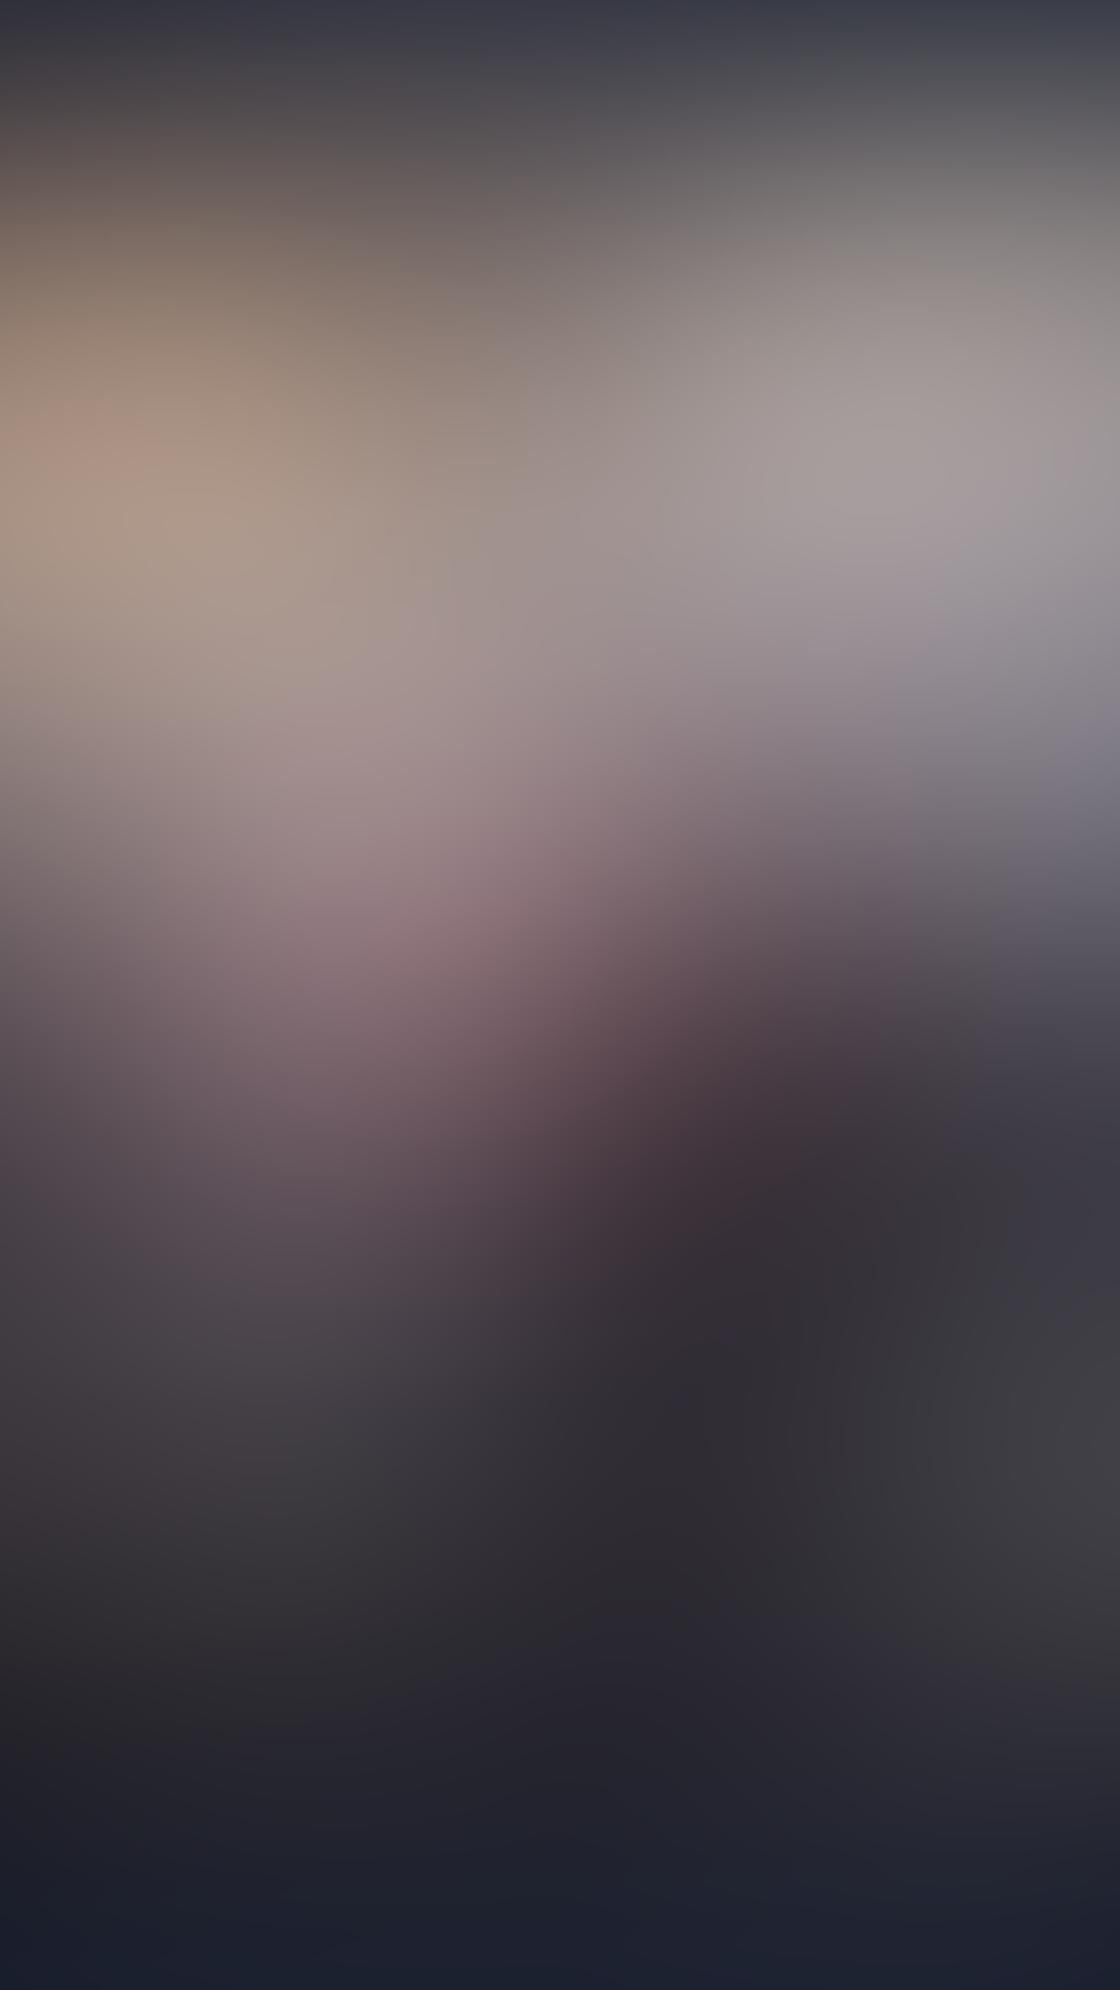 iPhone Photo Editing Workflow 40